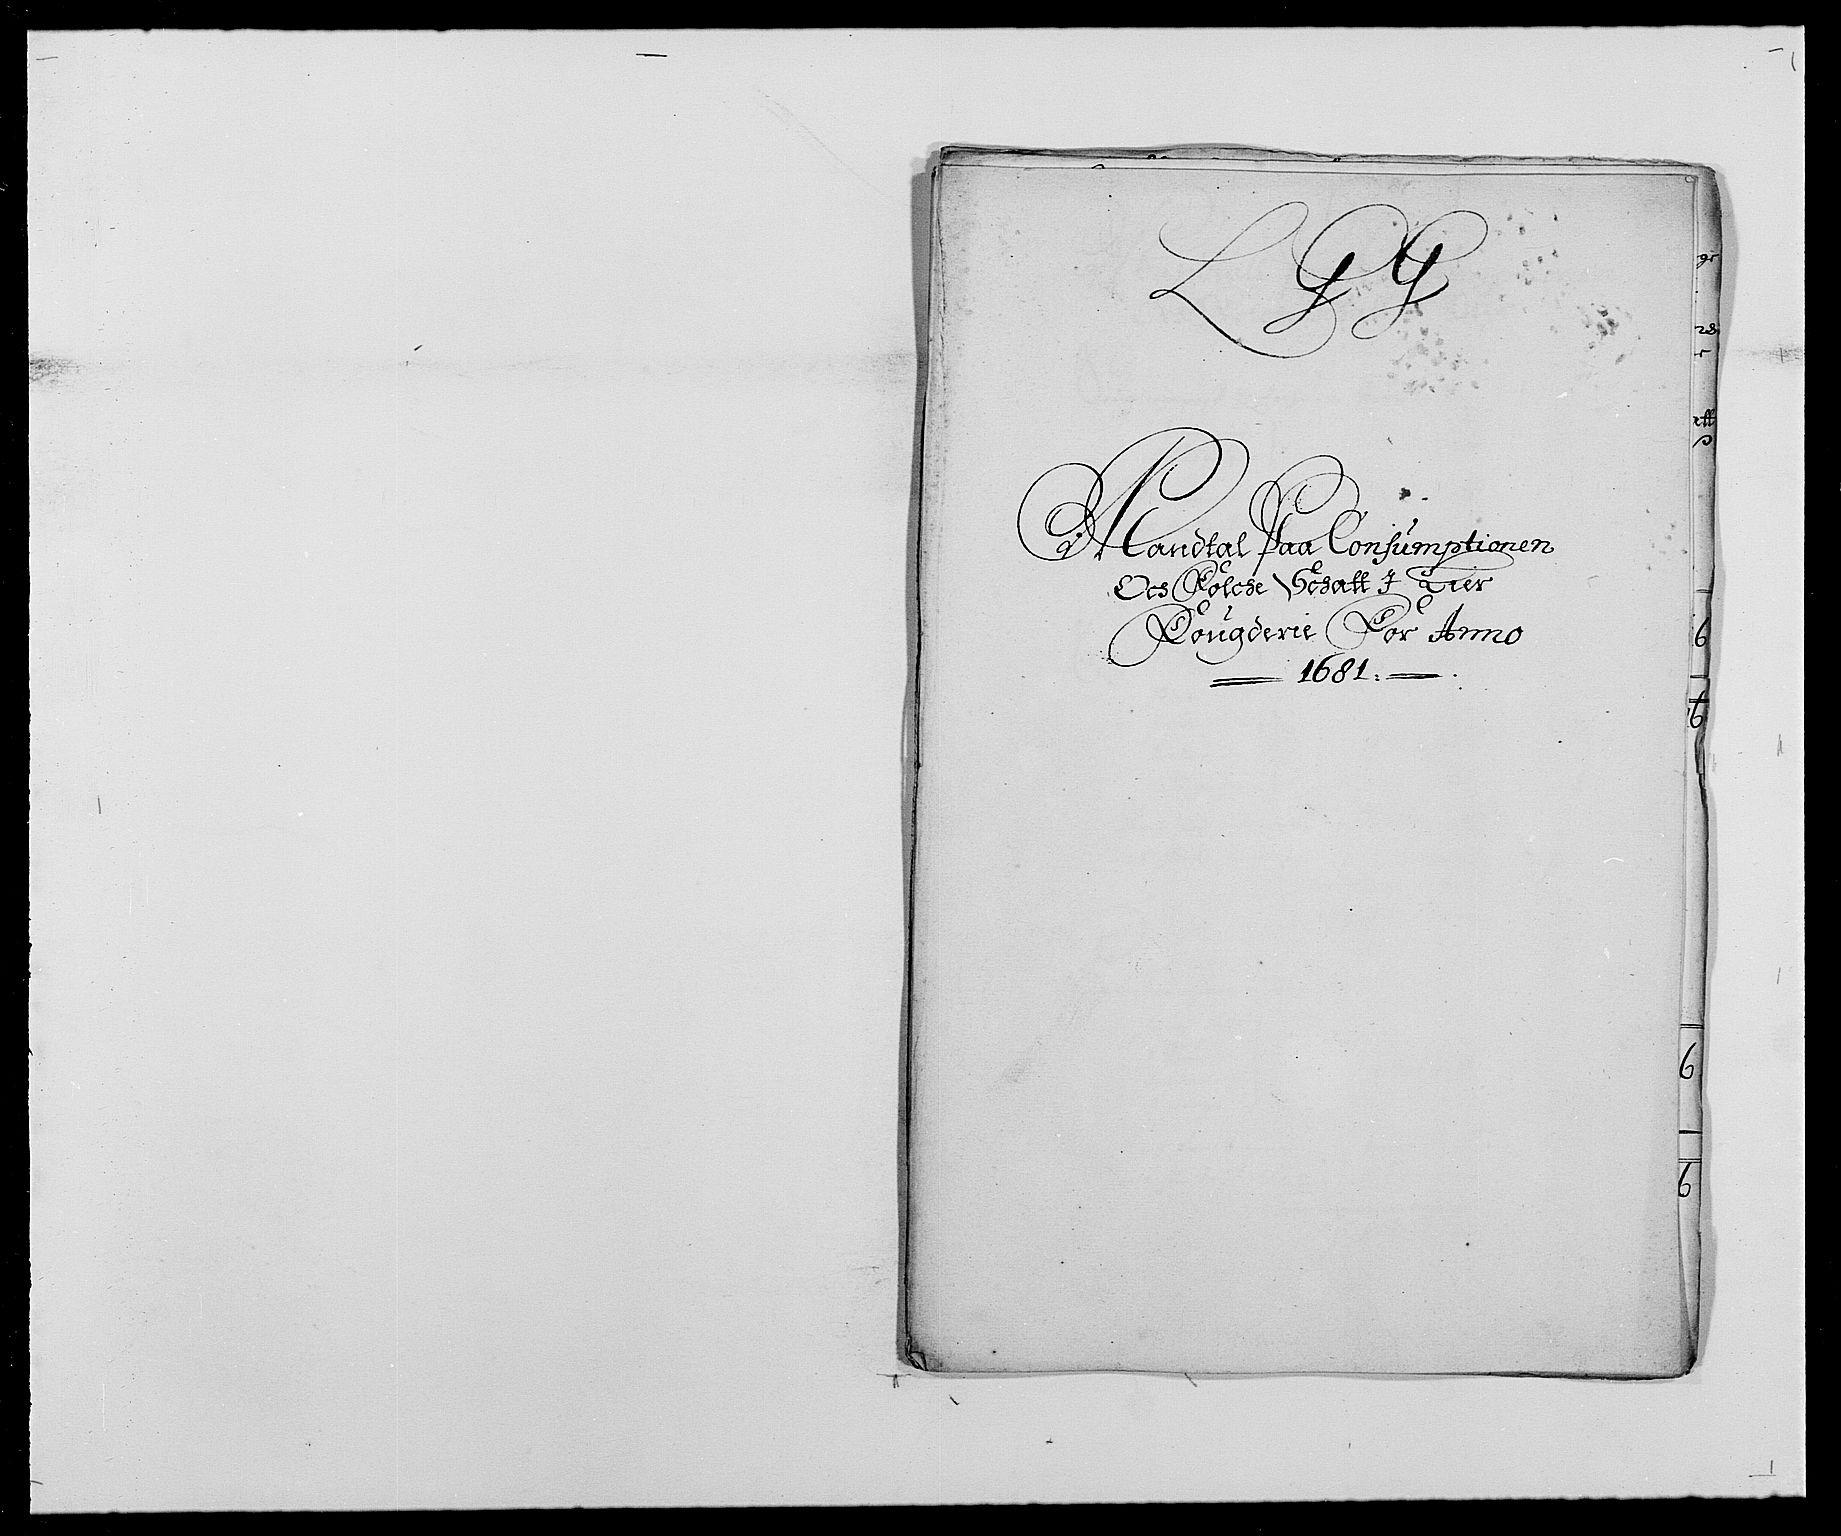 RA, Rentekammeret inntil 1814, Reviderte regnskaper, Fogderegnskap, R27/L1686: Fogderegnskap Lier, 1678-1686, s. 359